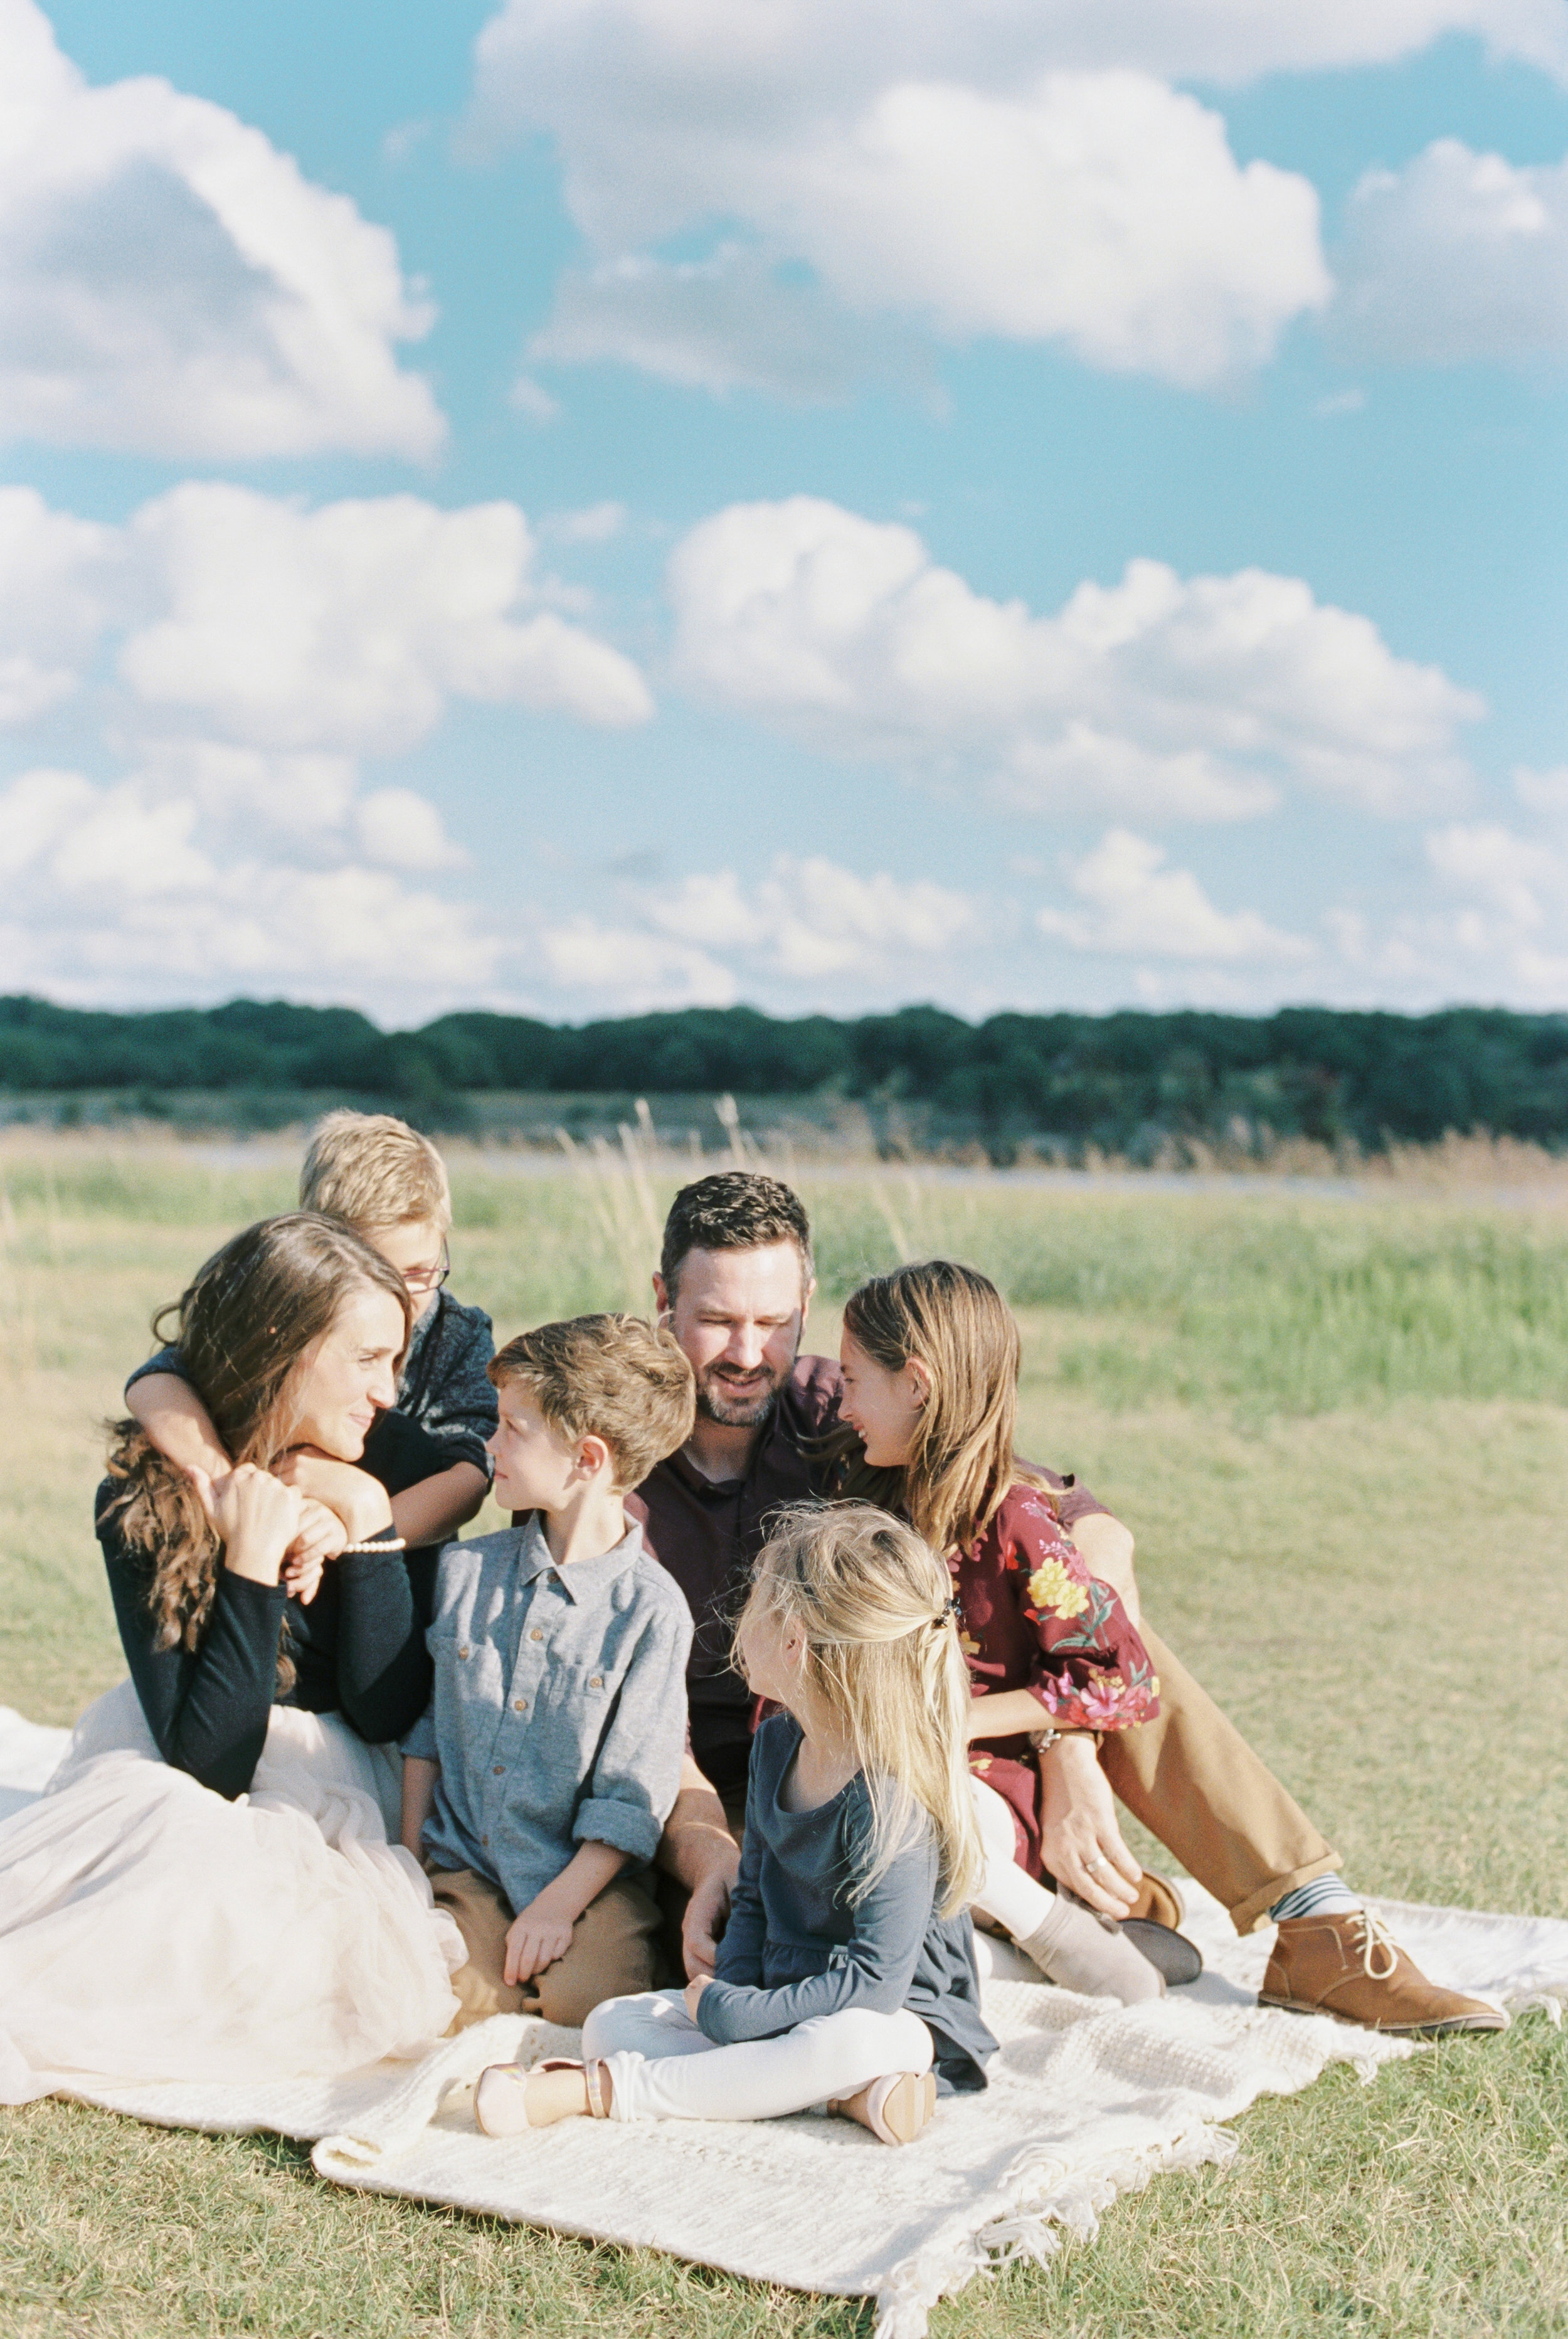 LOUDIN FAMILY